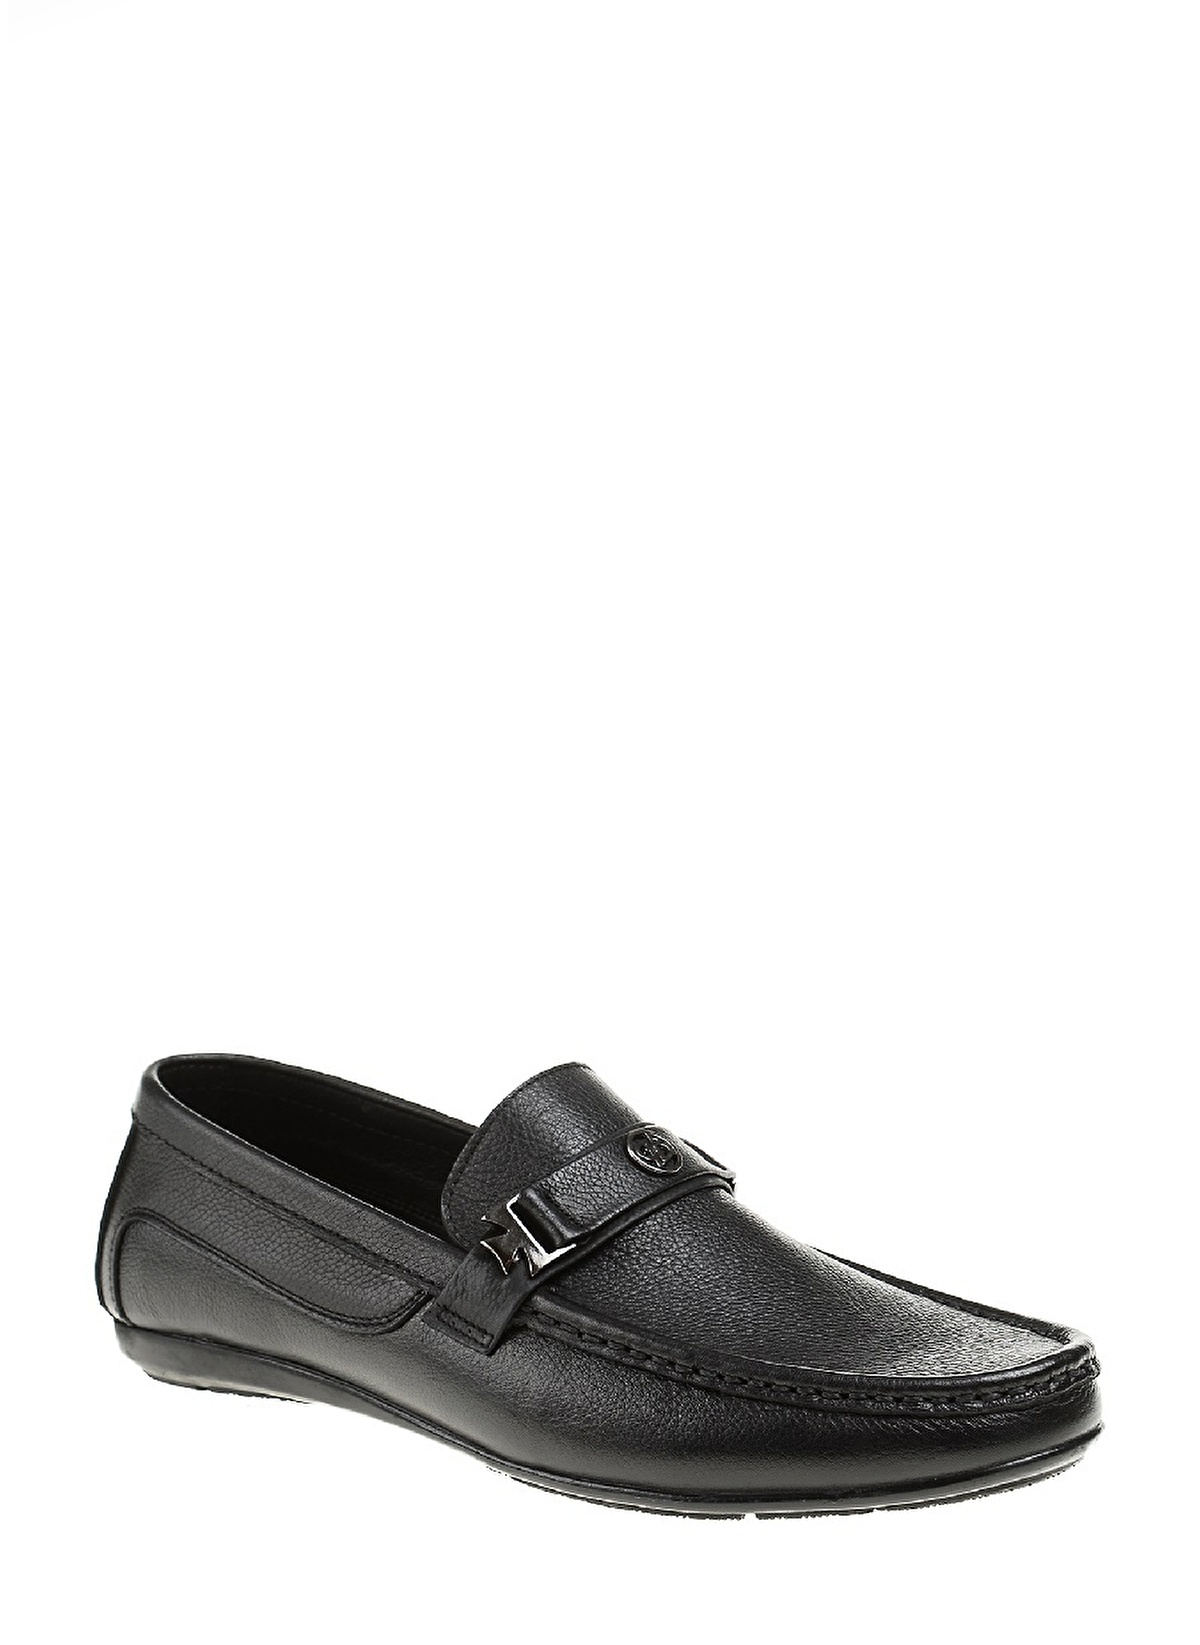 Divarese Ayakkabı 5018746-e-loafer – 239.0 TL